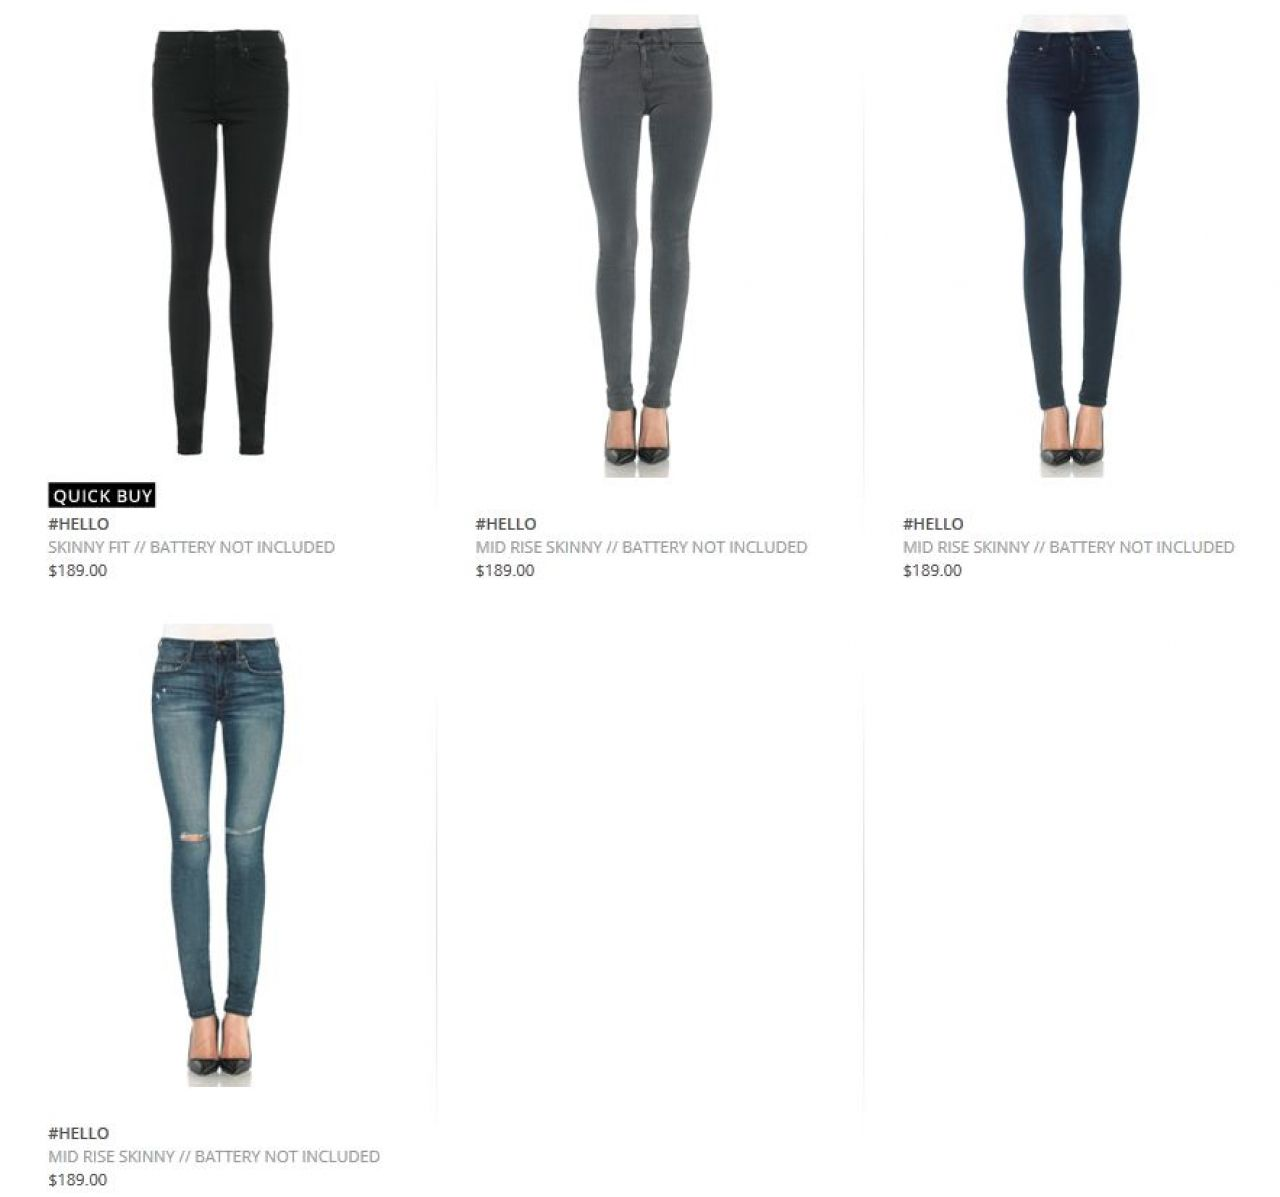 5004009_jeans-prix